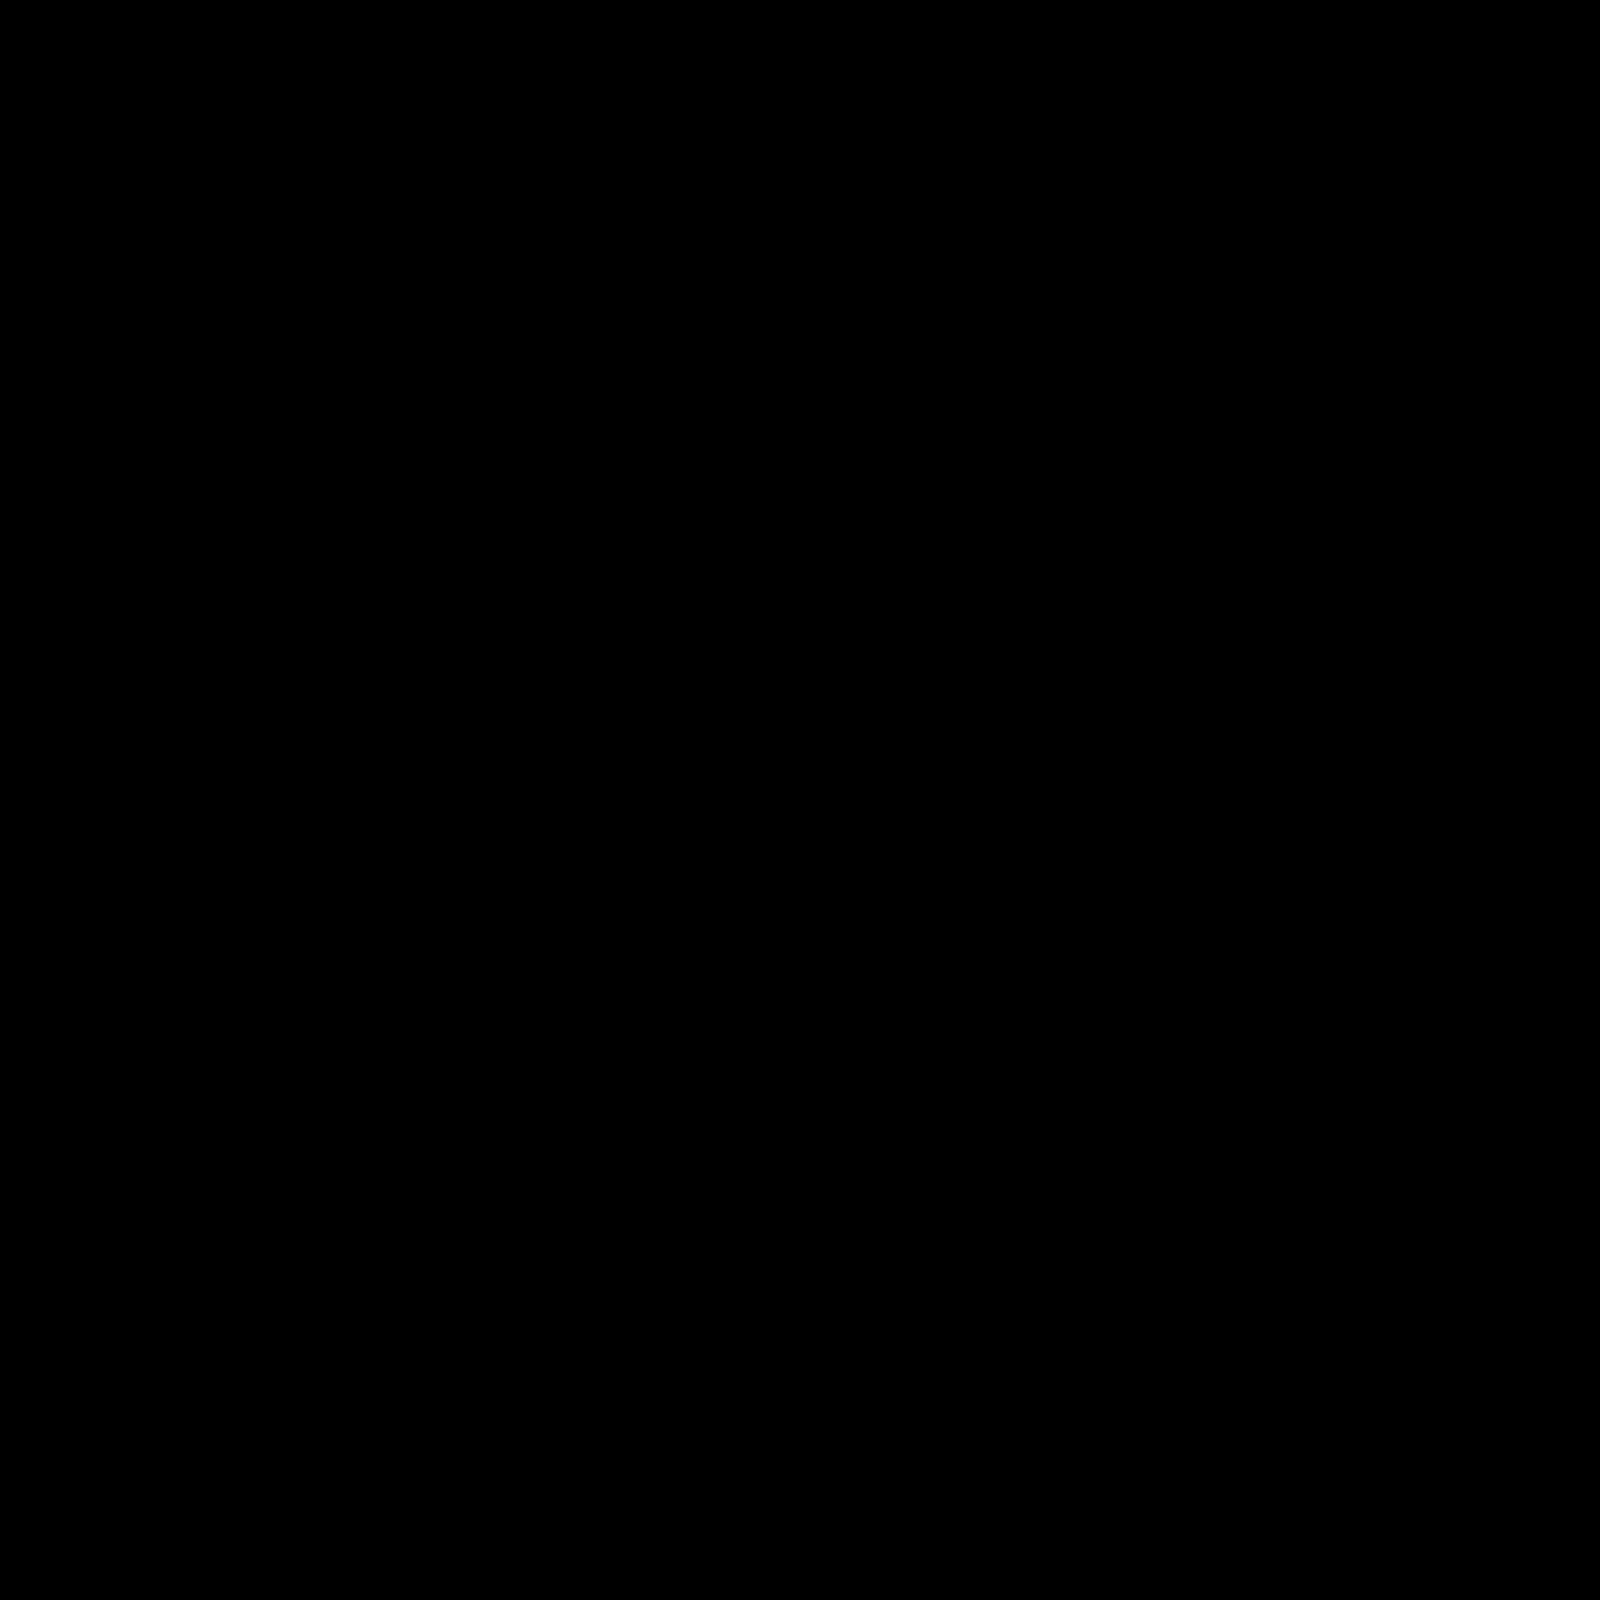 Royal Air Force icon